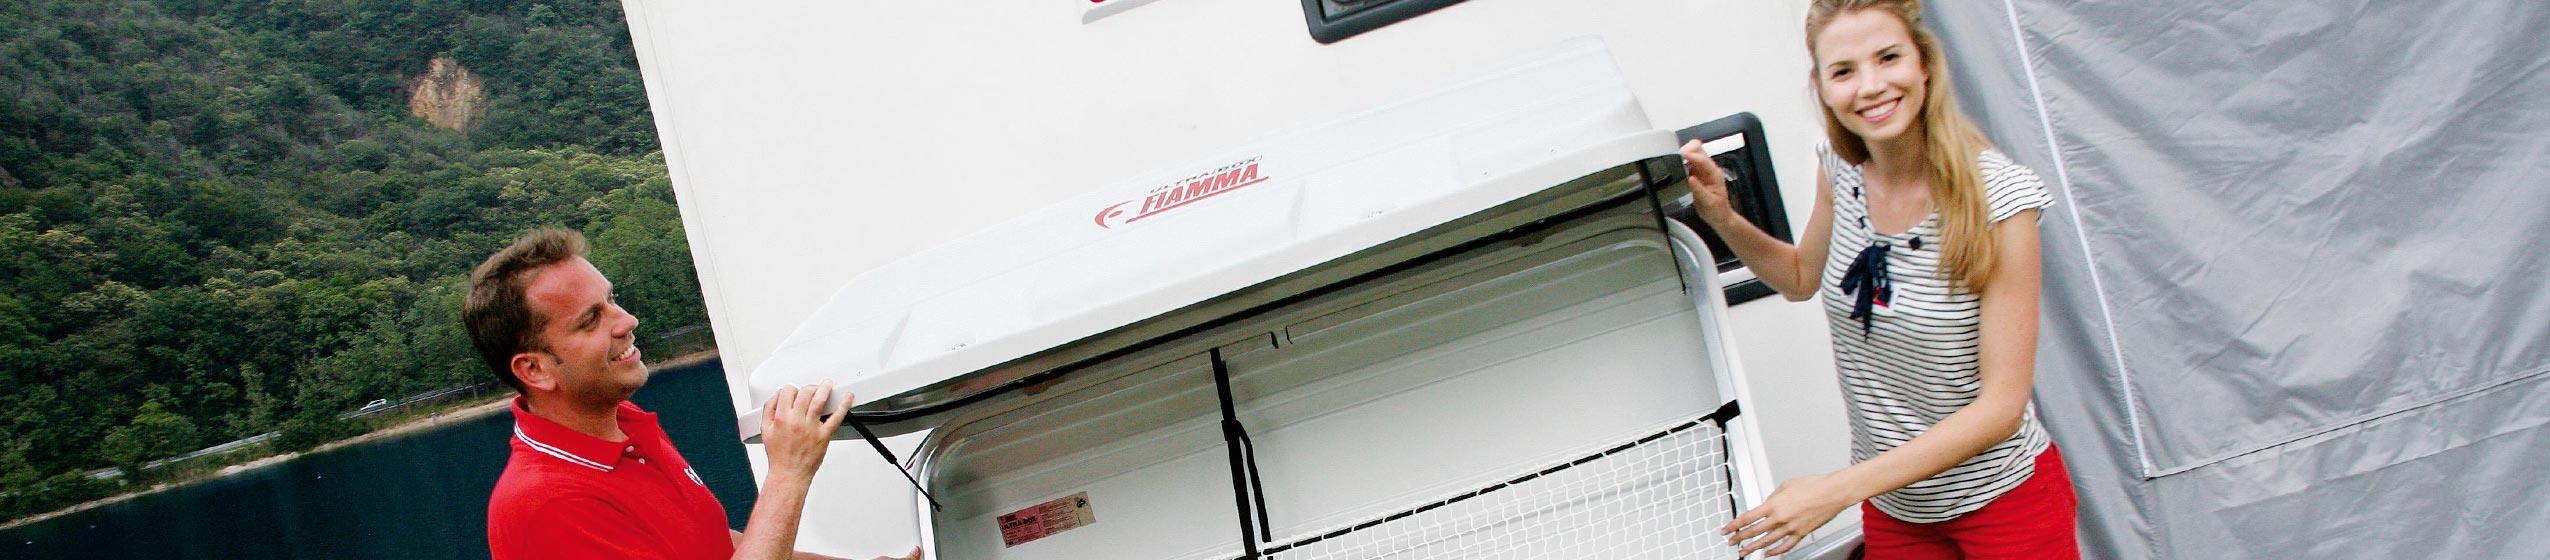 Cofre Fiamma Ultrabox 520 - Caravaning Integral